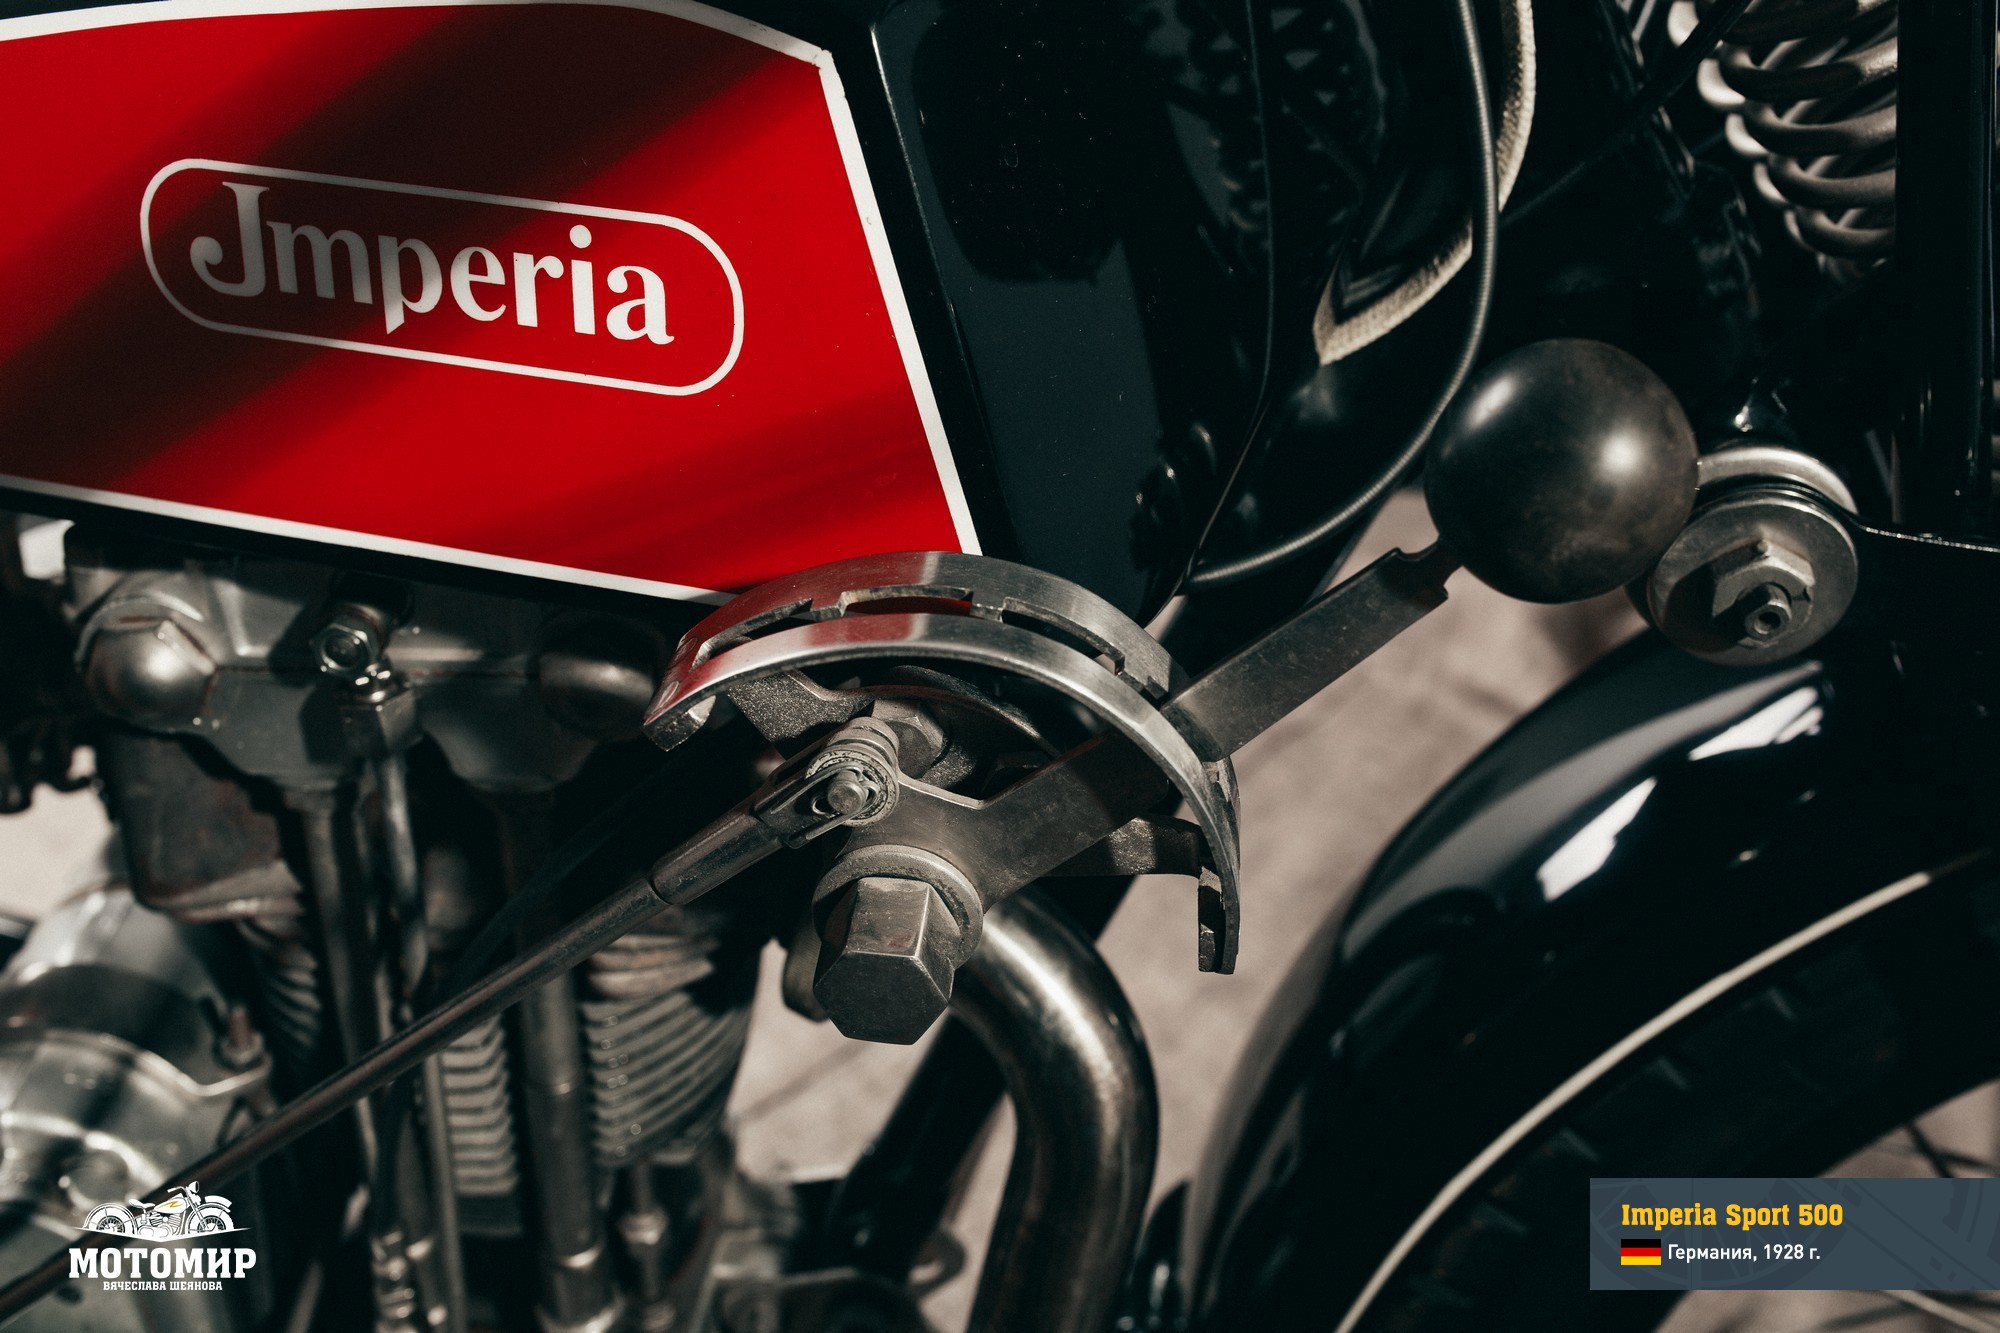 imperia-sport-500-201601-web-35